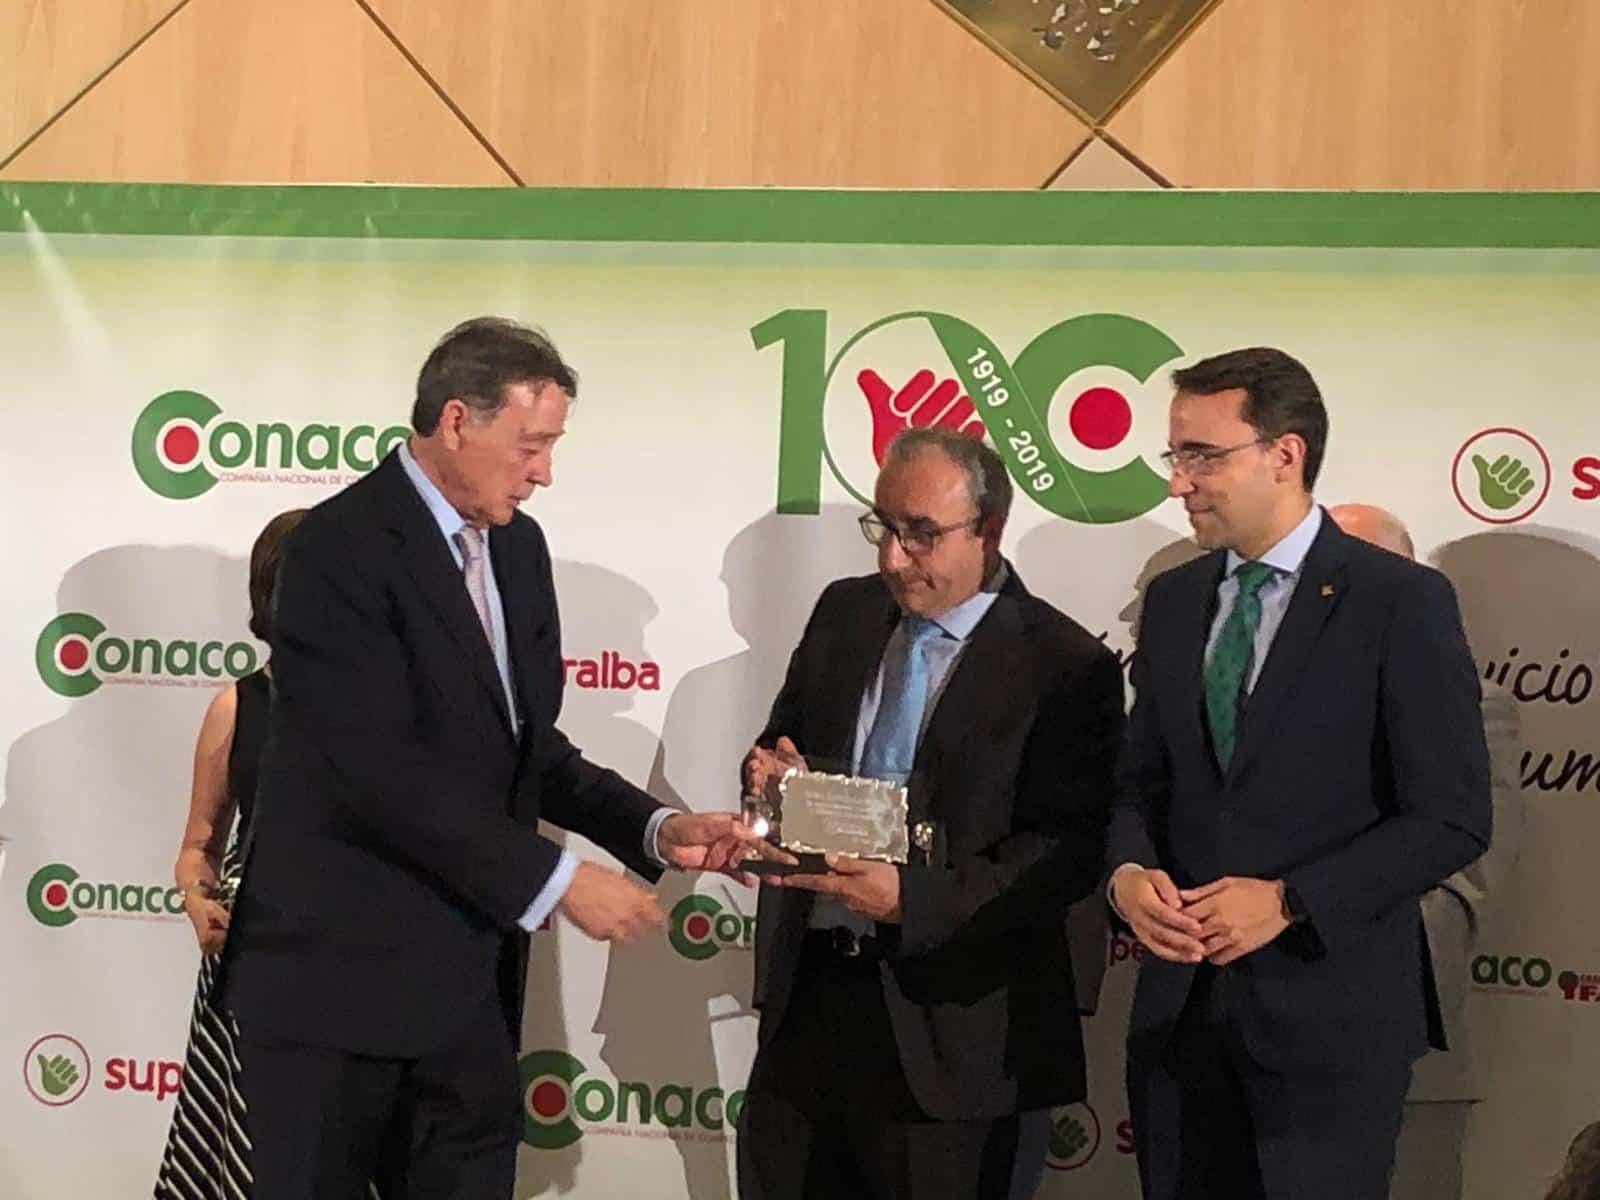 https://blog.globalcaja.es/wp-content/uploads/2019/06/100-Aniversario-Conaco.jpg